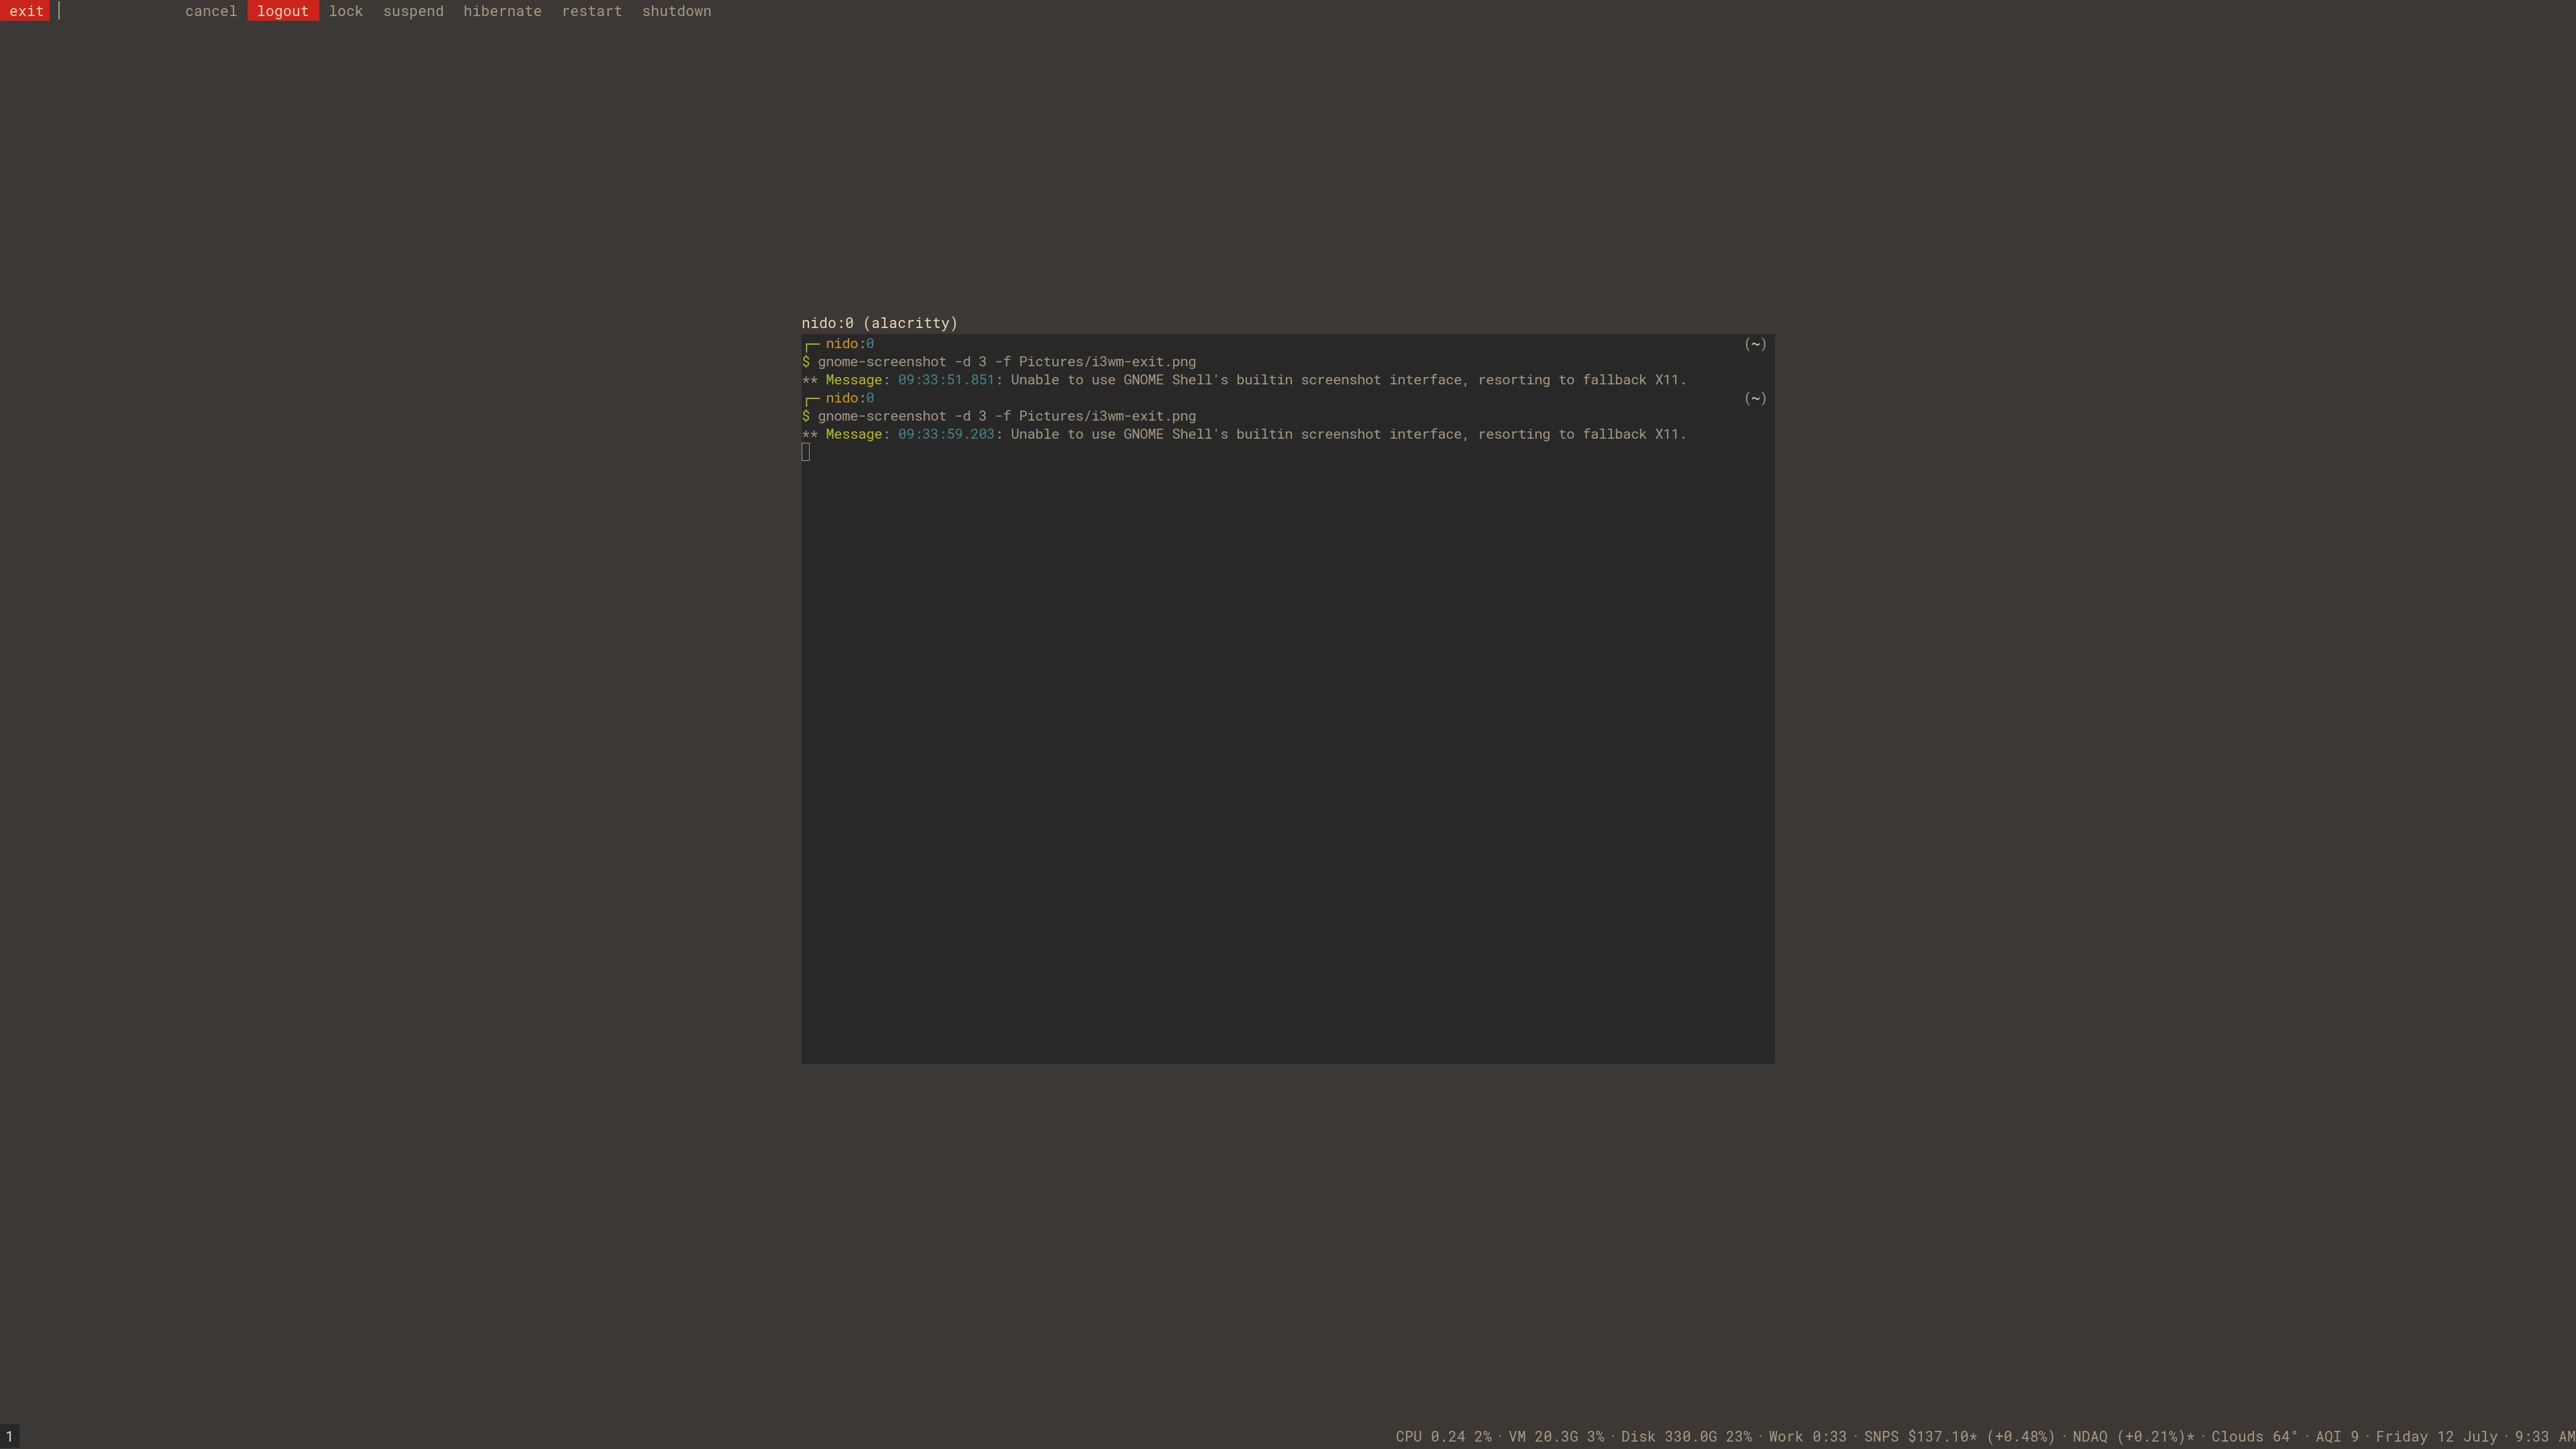 What's your favourite terminal emulator? - Solus Forum